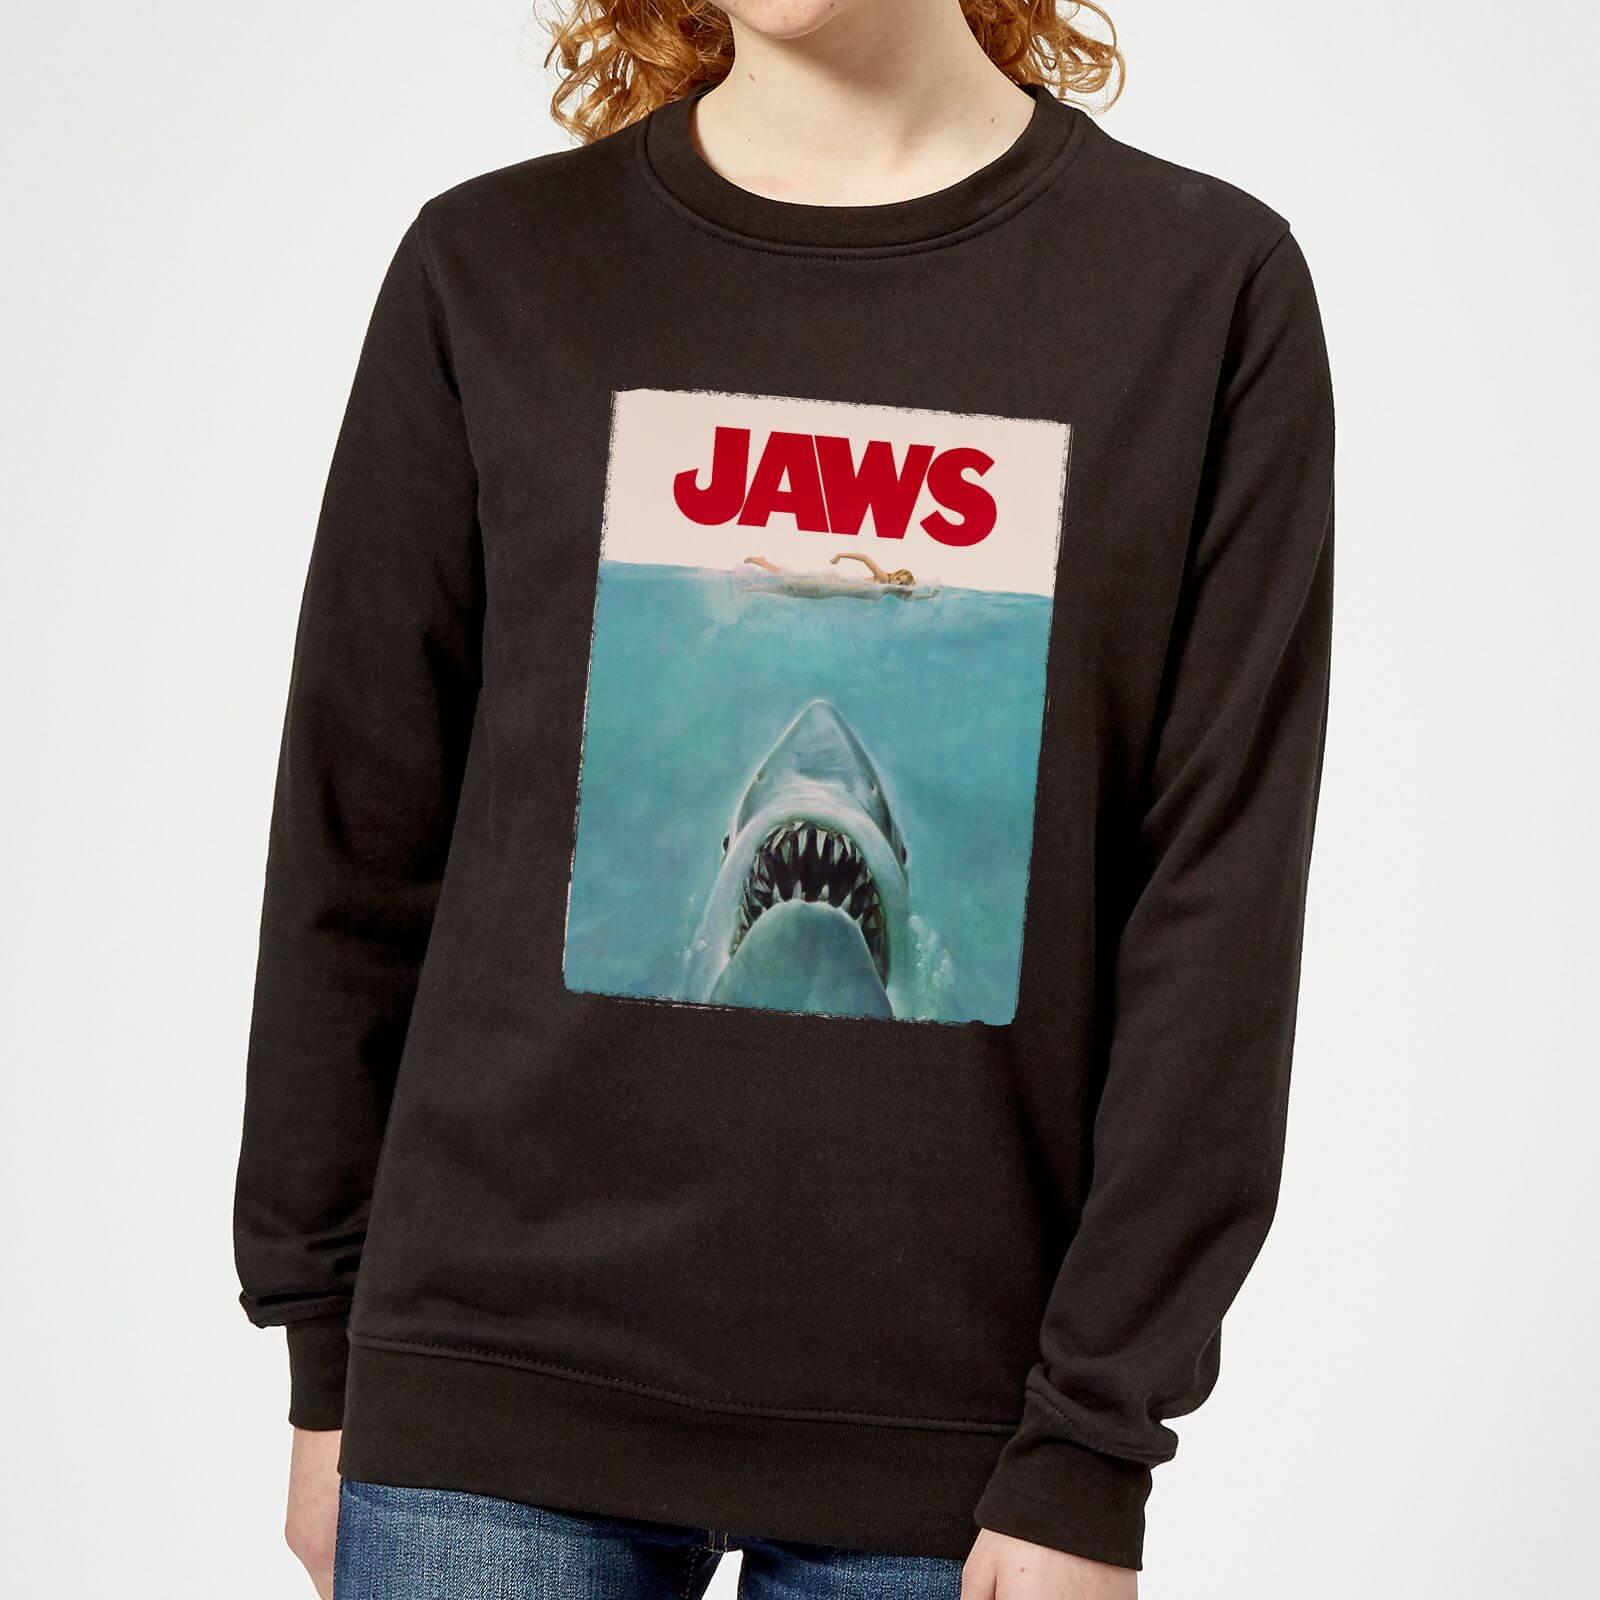 Jaws Classic Poster Women's Sweatshirt - Black - S - Black